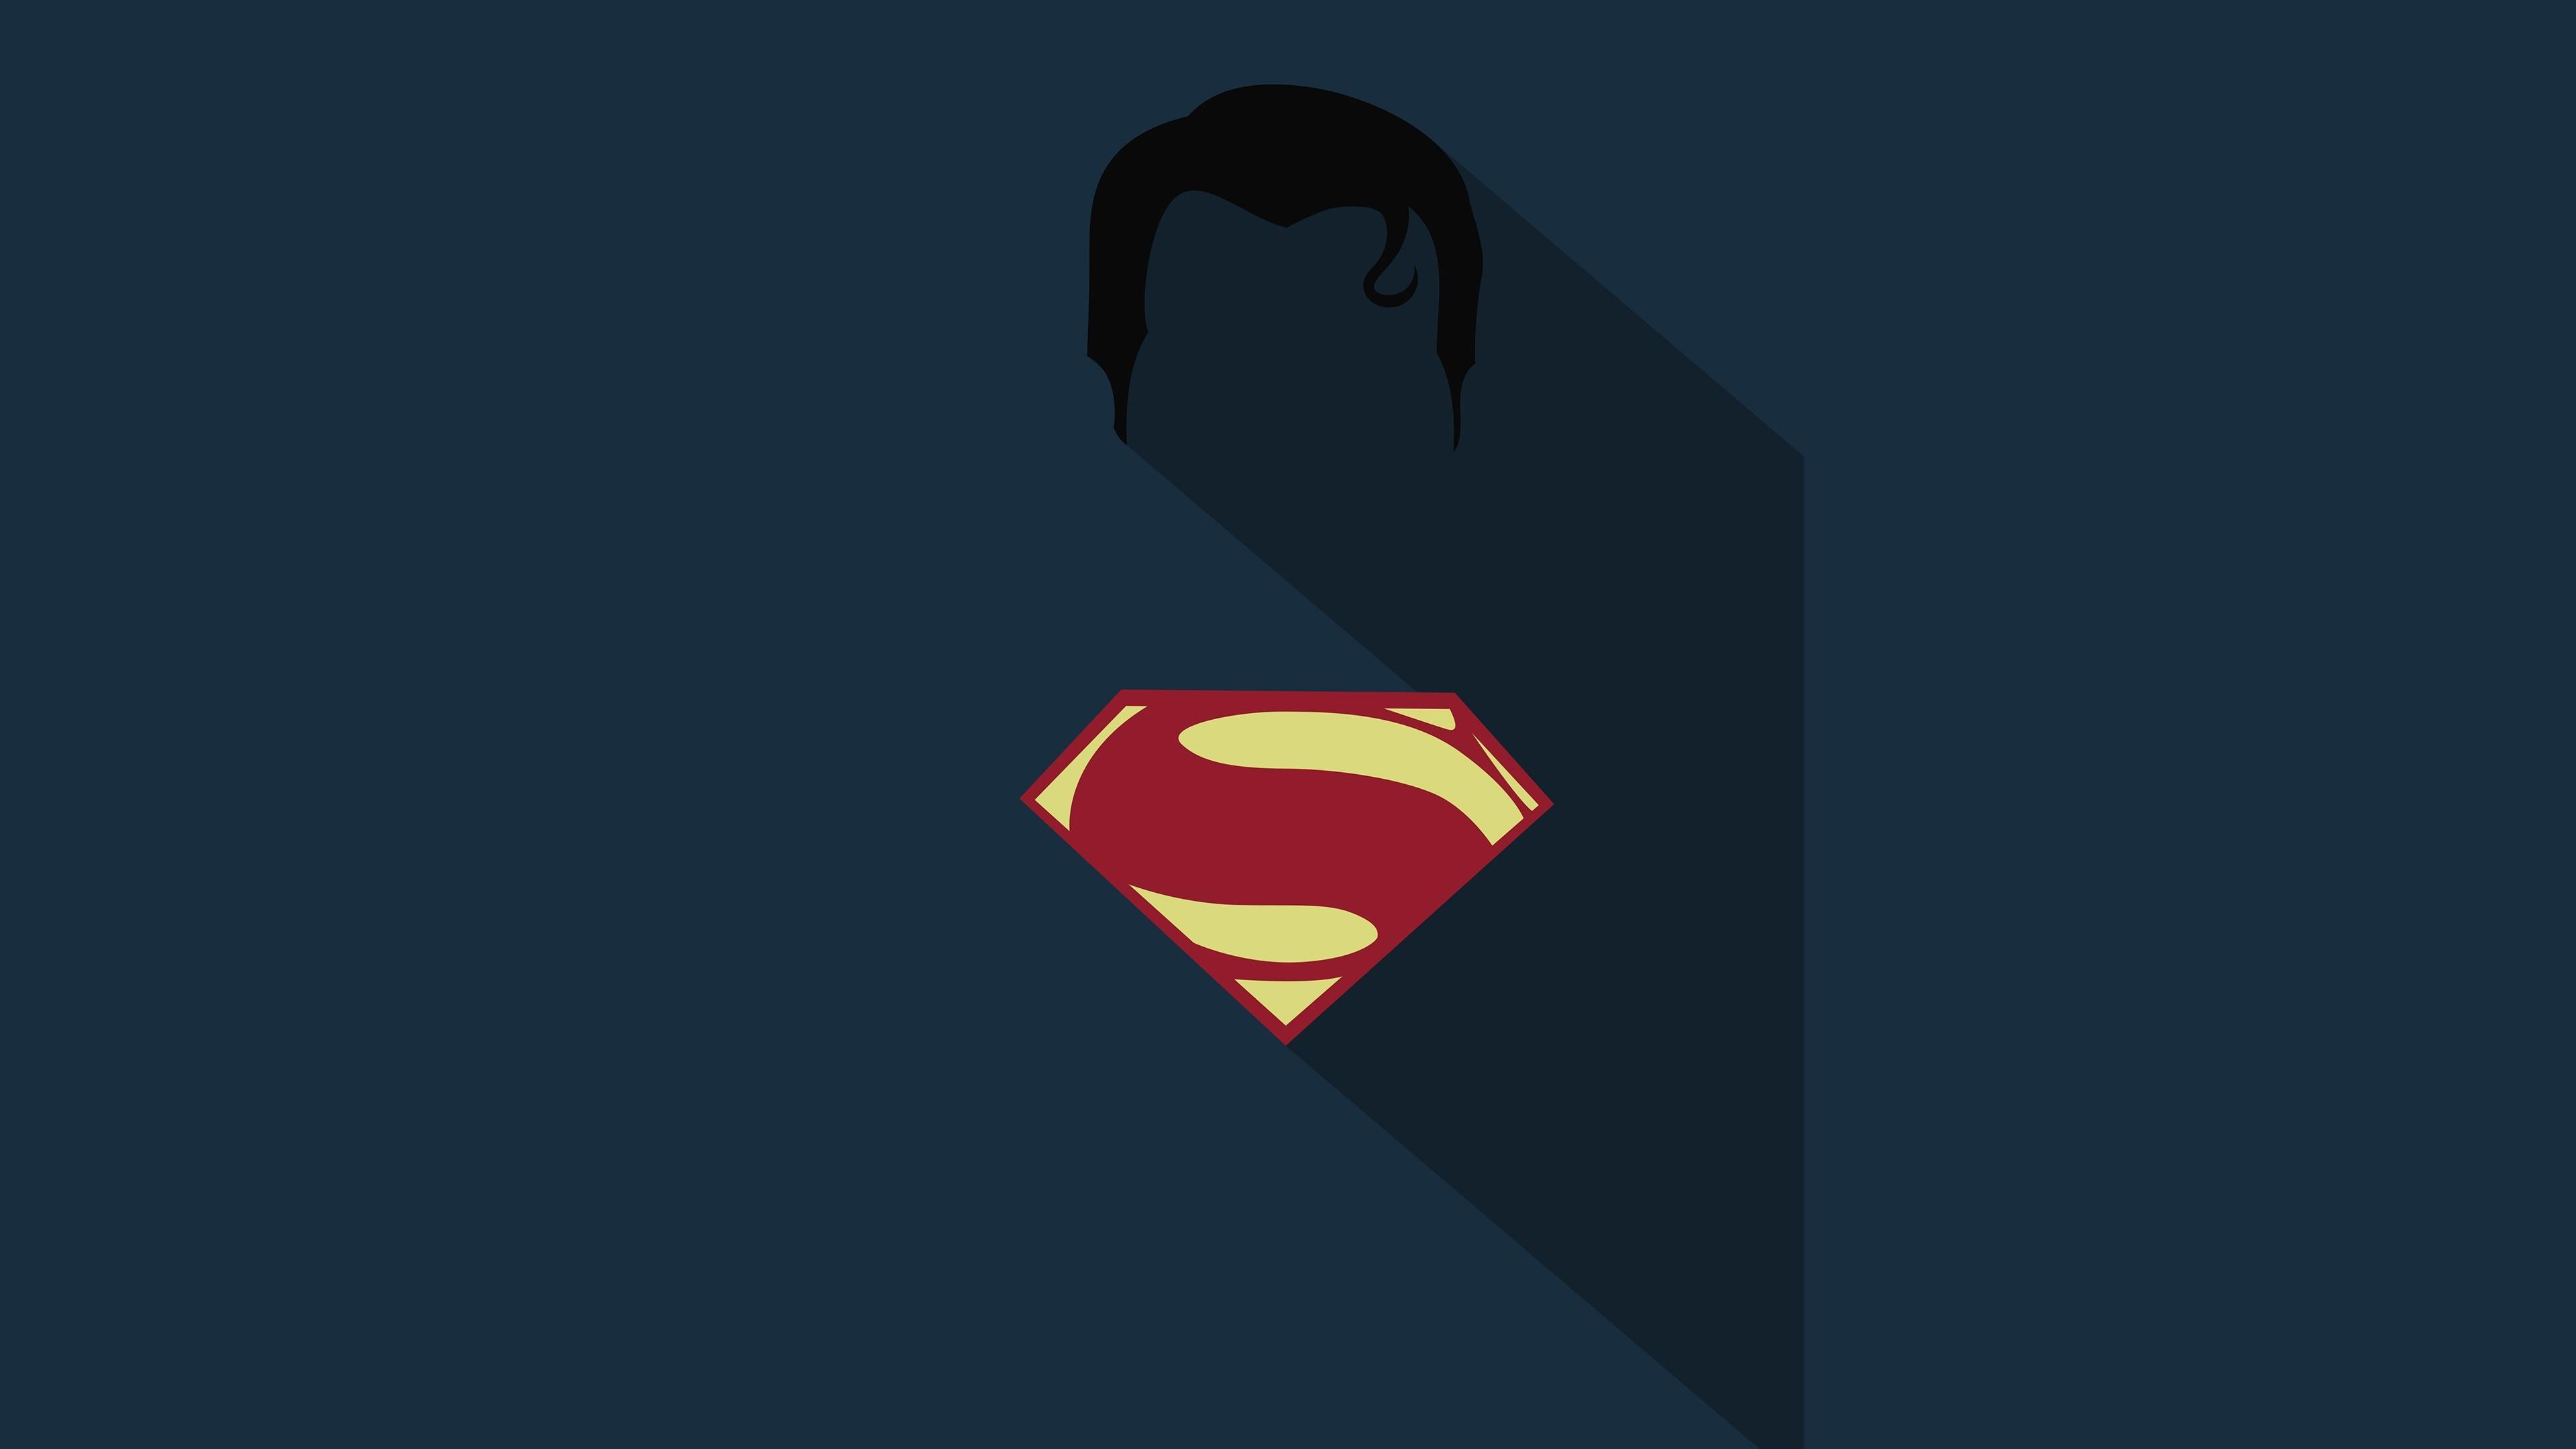 Superman Logo Wallpaper 183 ① Download Free Amazing High